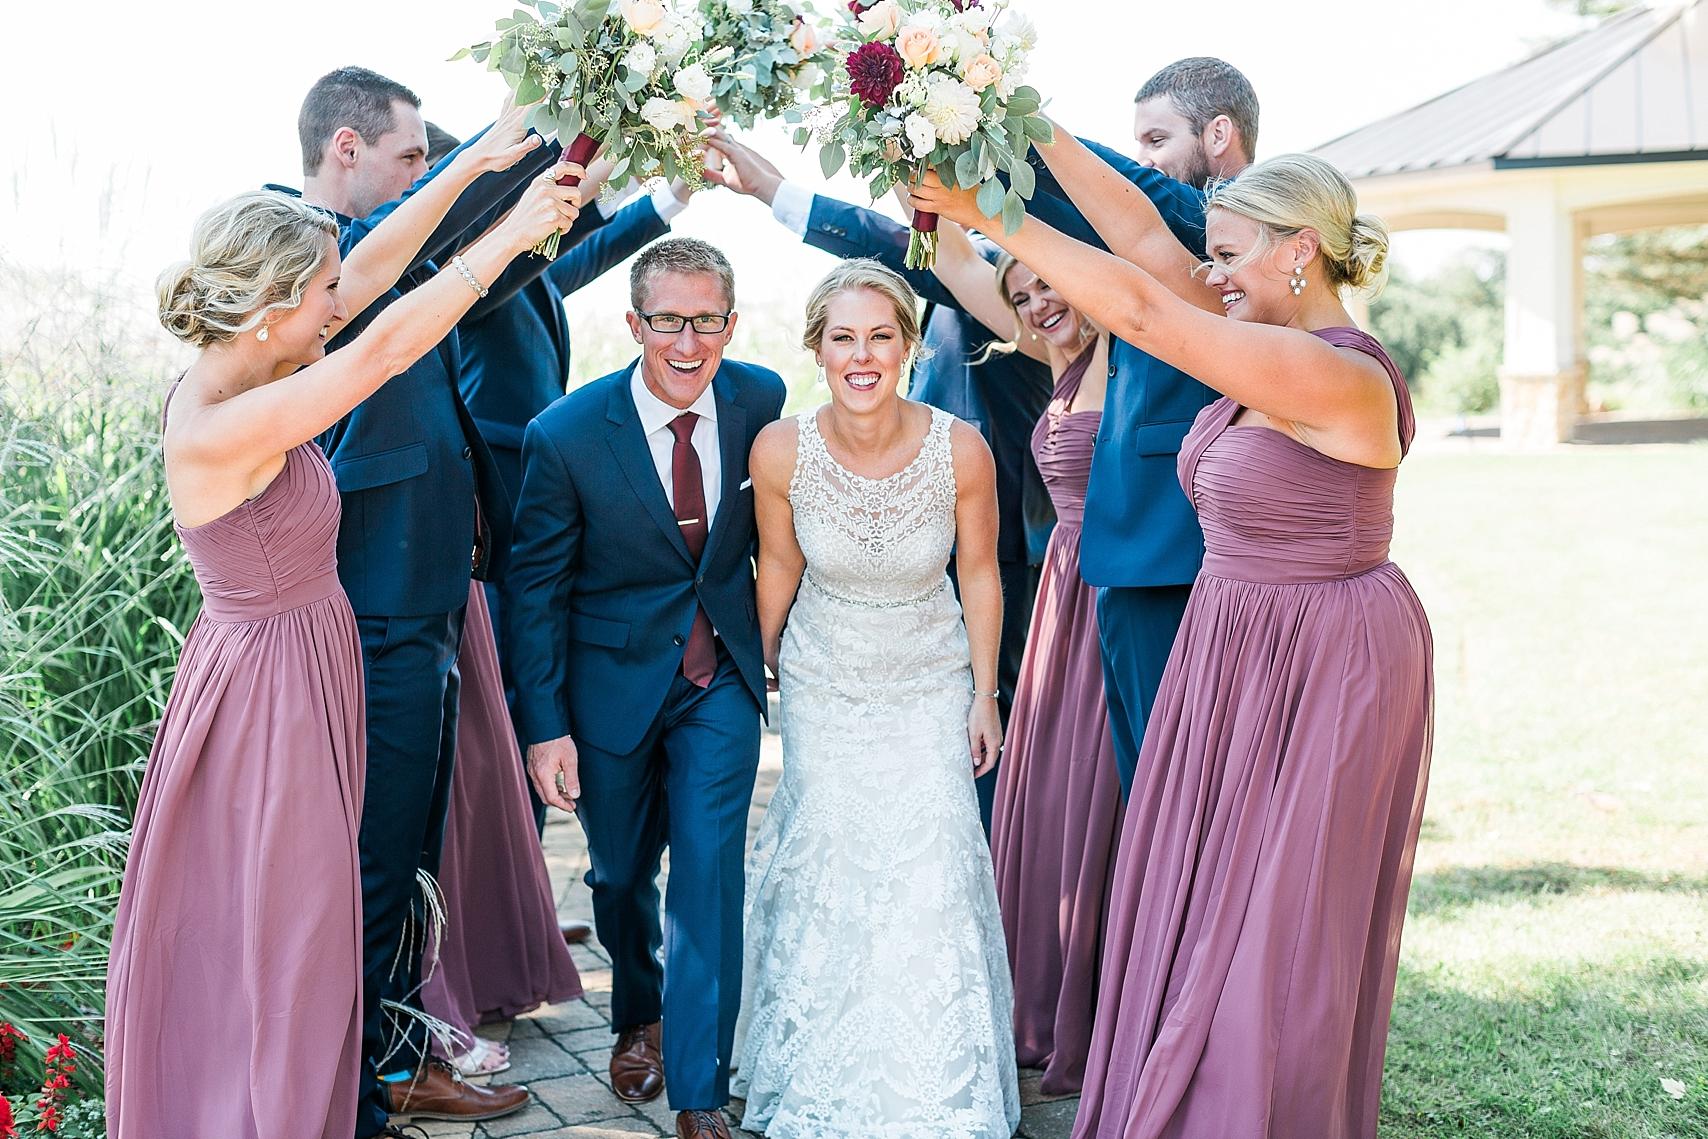 Minnesota Minneapolis Wedding Photographer Best Of 2018 Weddings Mallory Kiesow Photography_0099.jpg